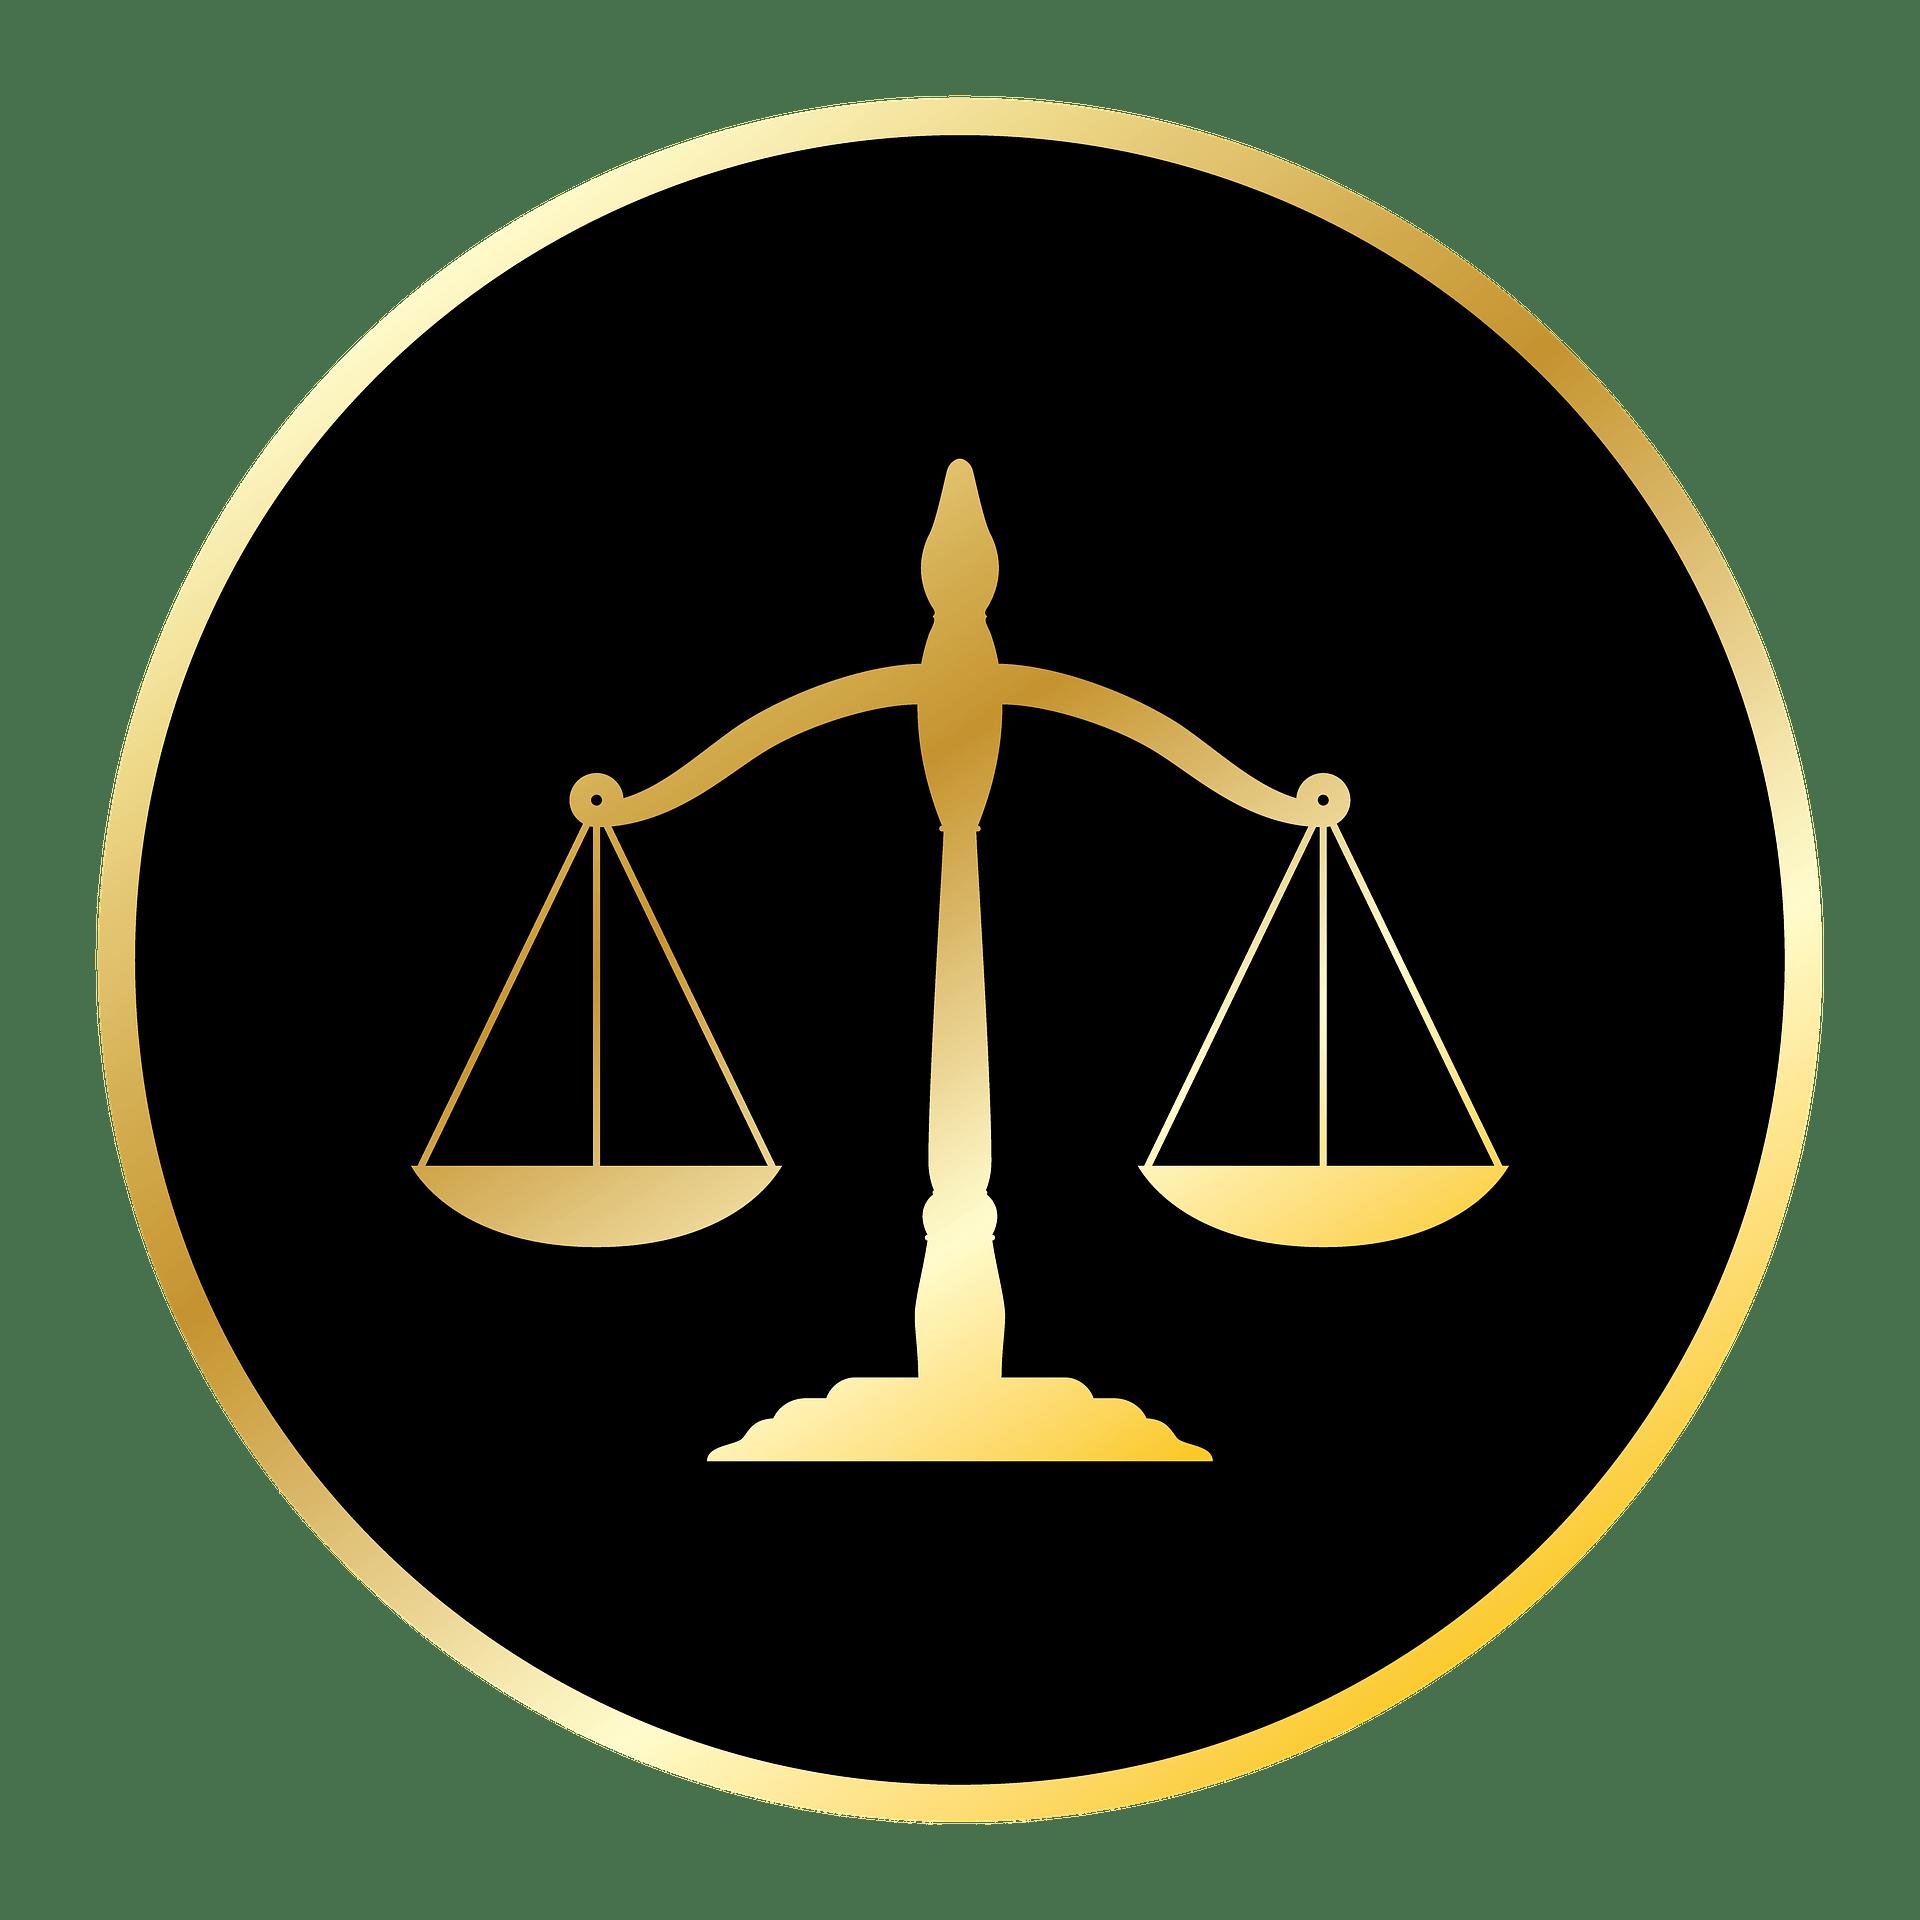 Vladavina prava. Vir: Pixabay